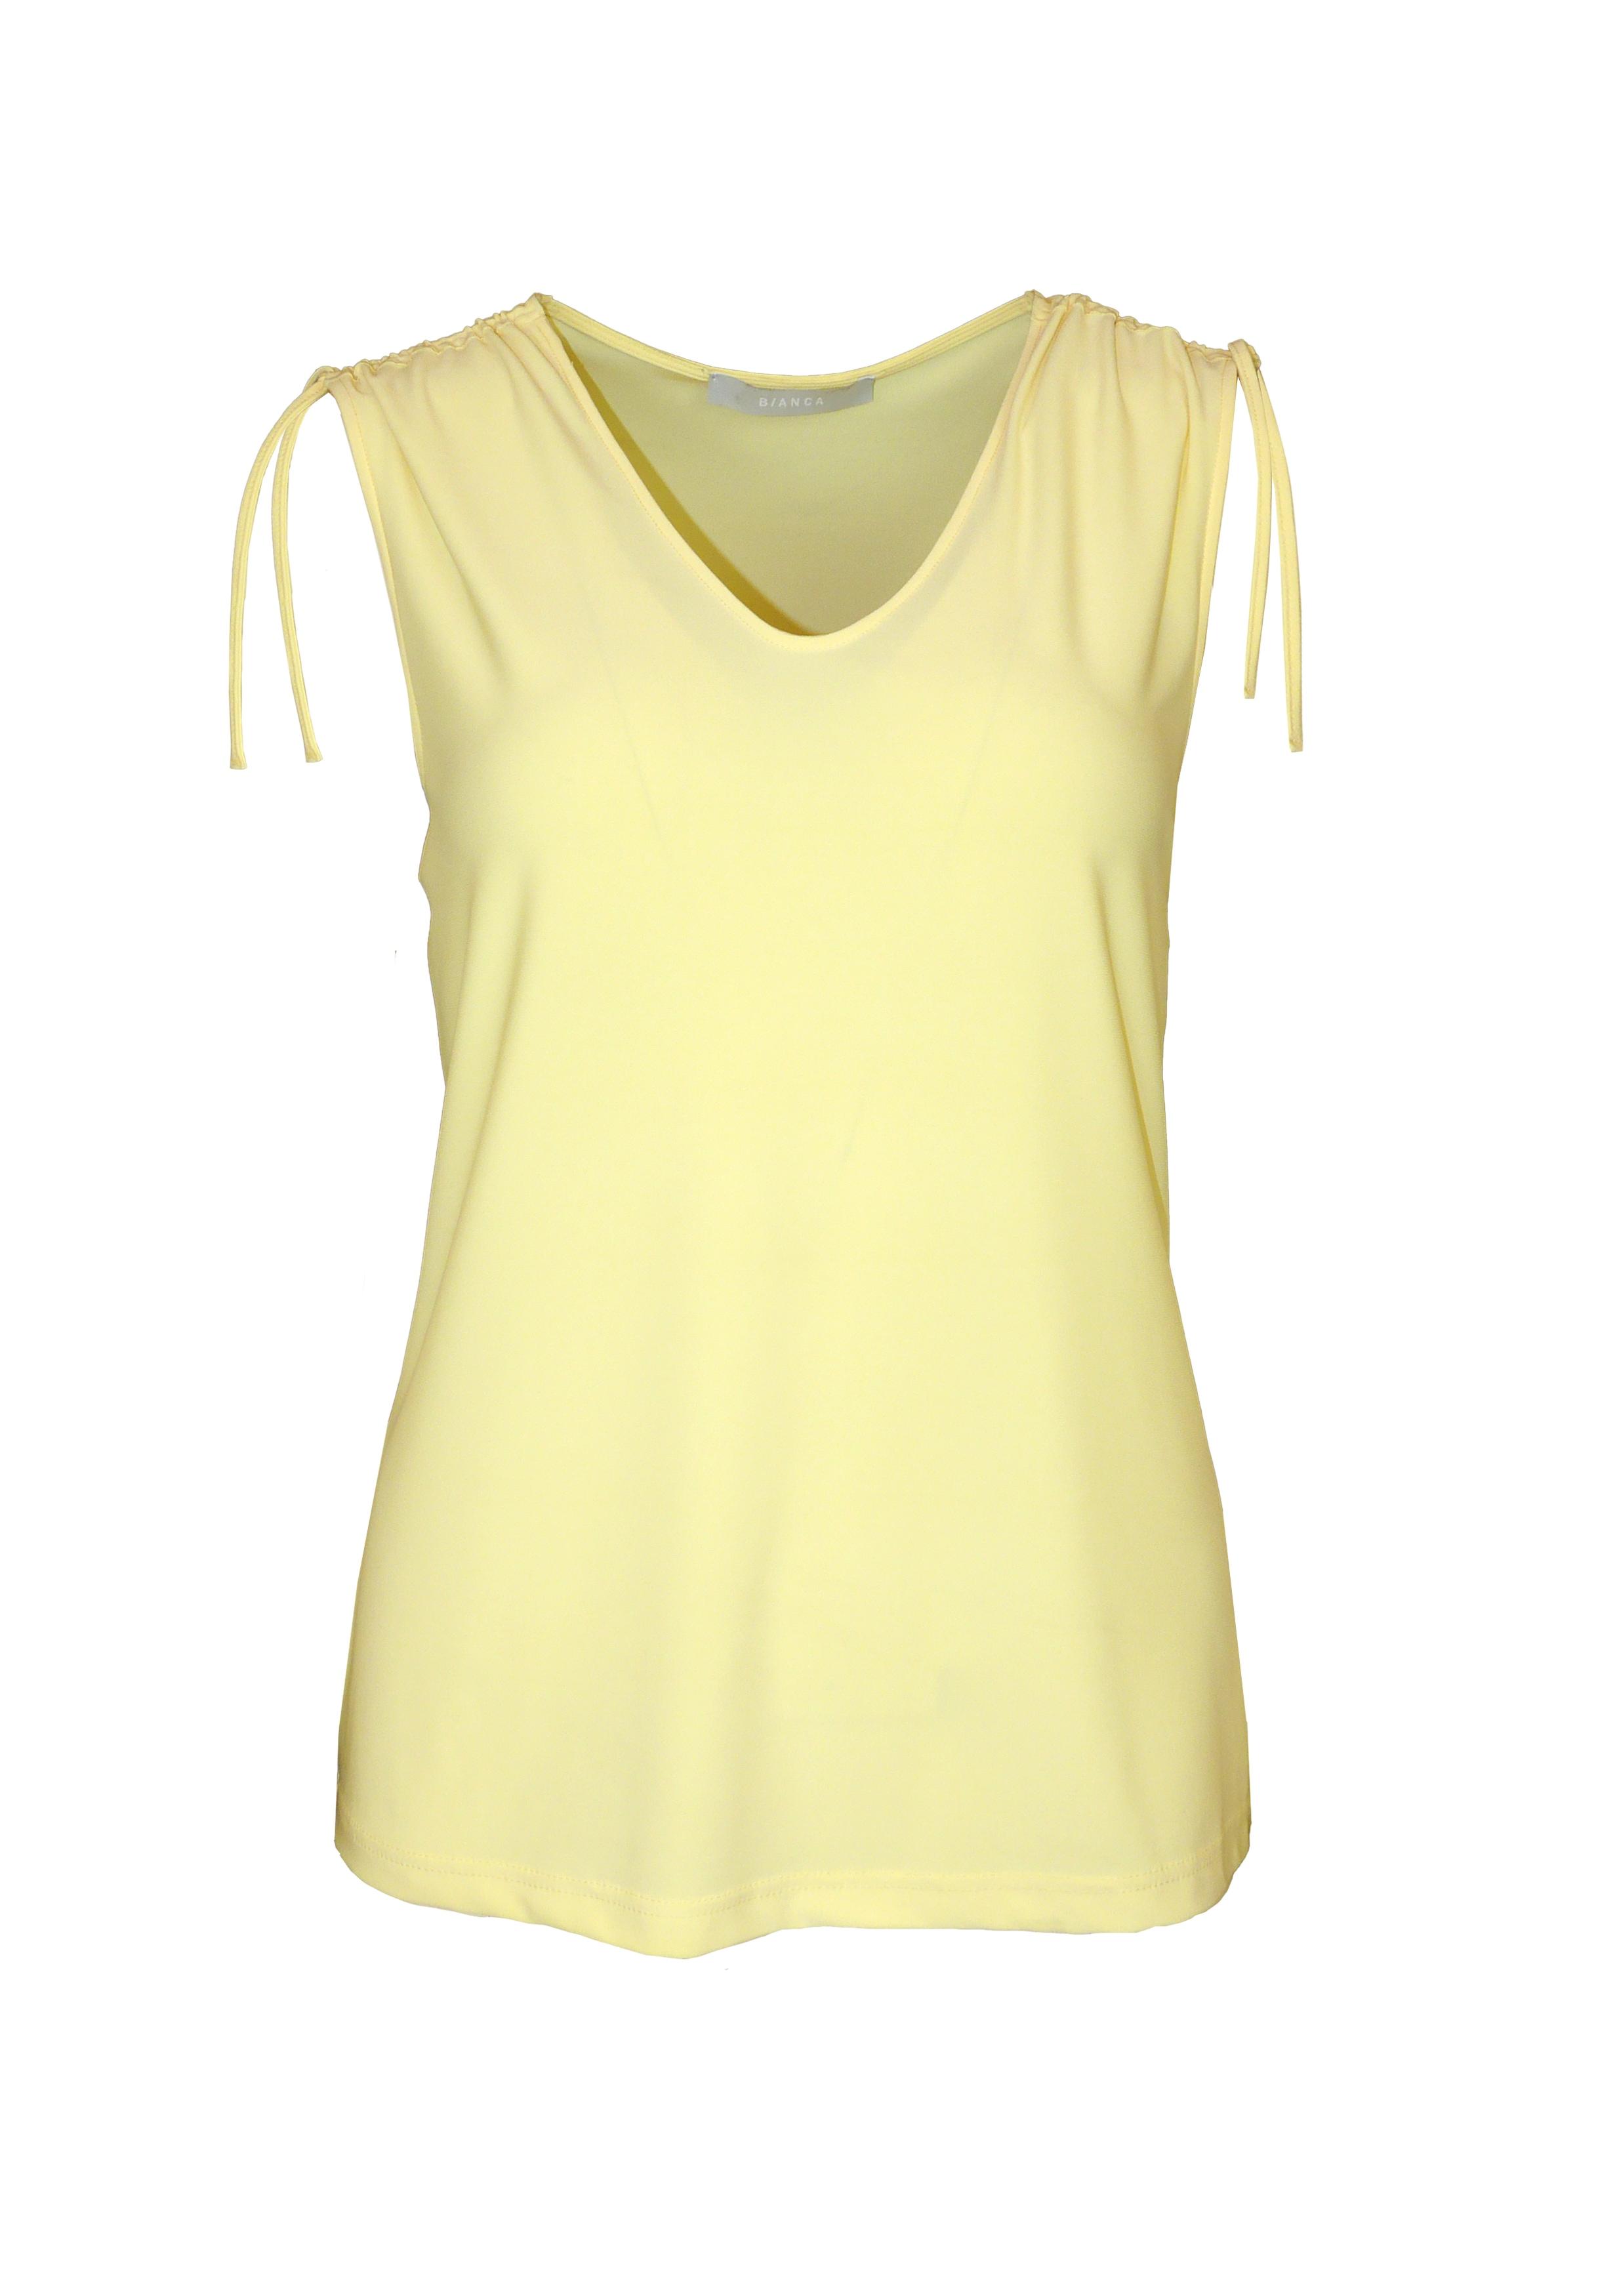 bianca -  Kurzarmshirt TANY, mit cooler Raffung im Schulterbereich